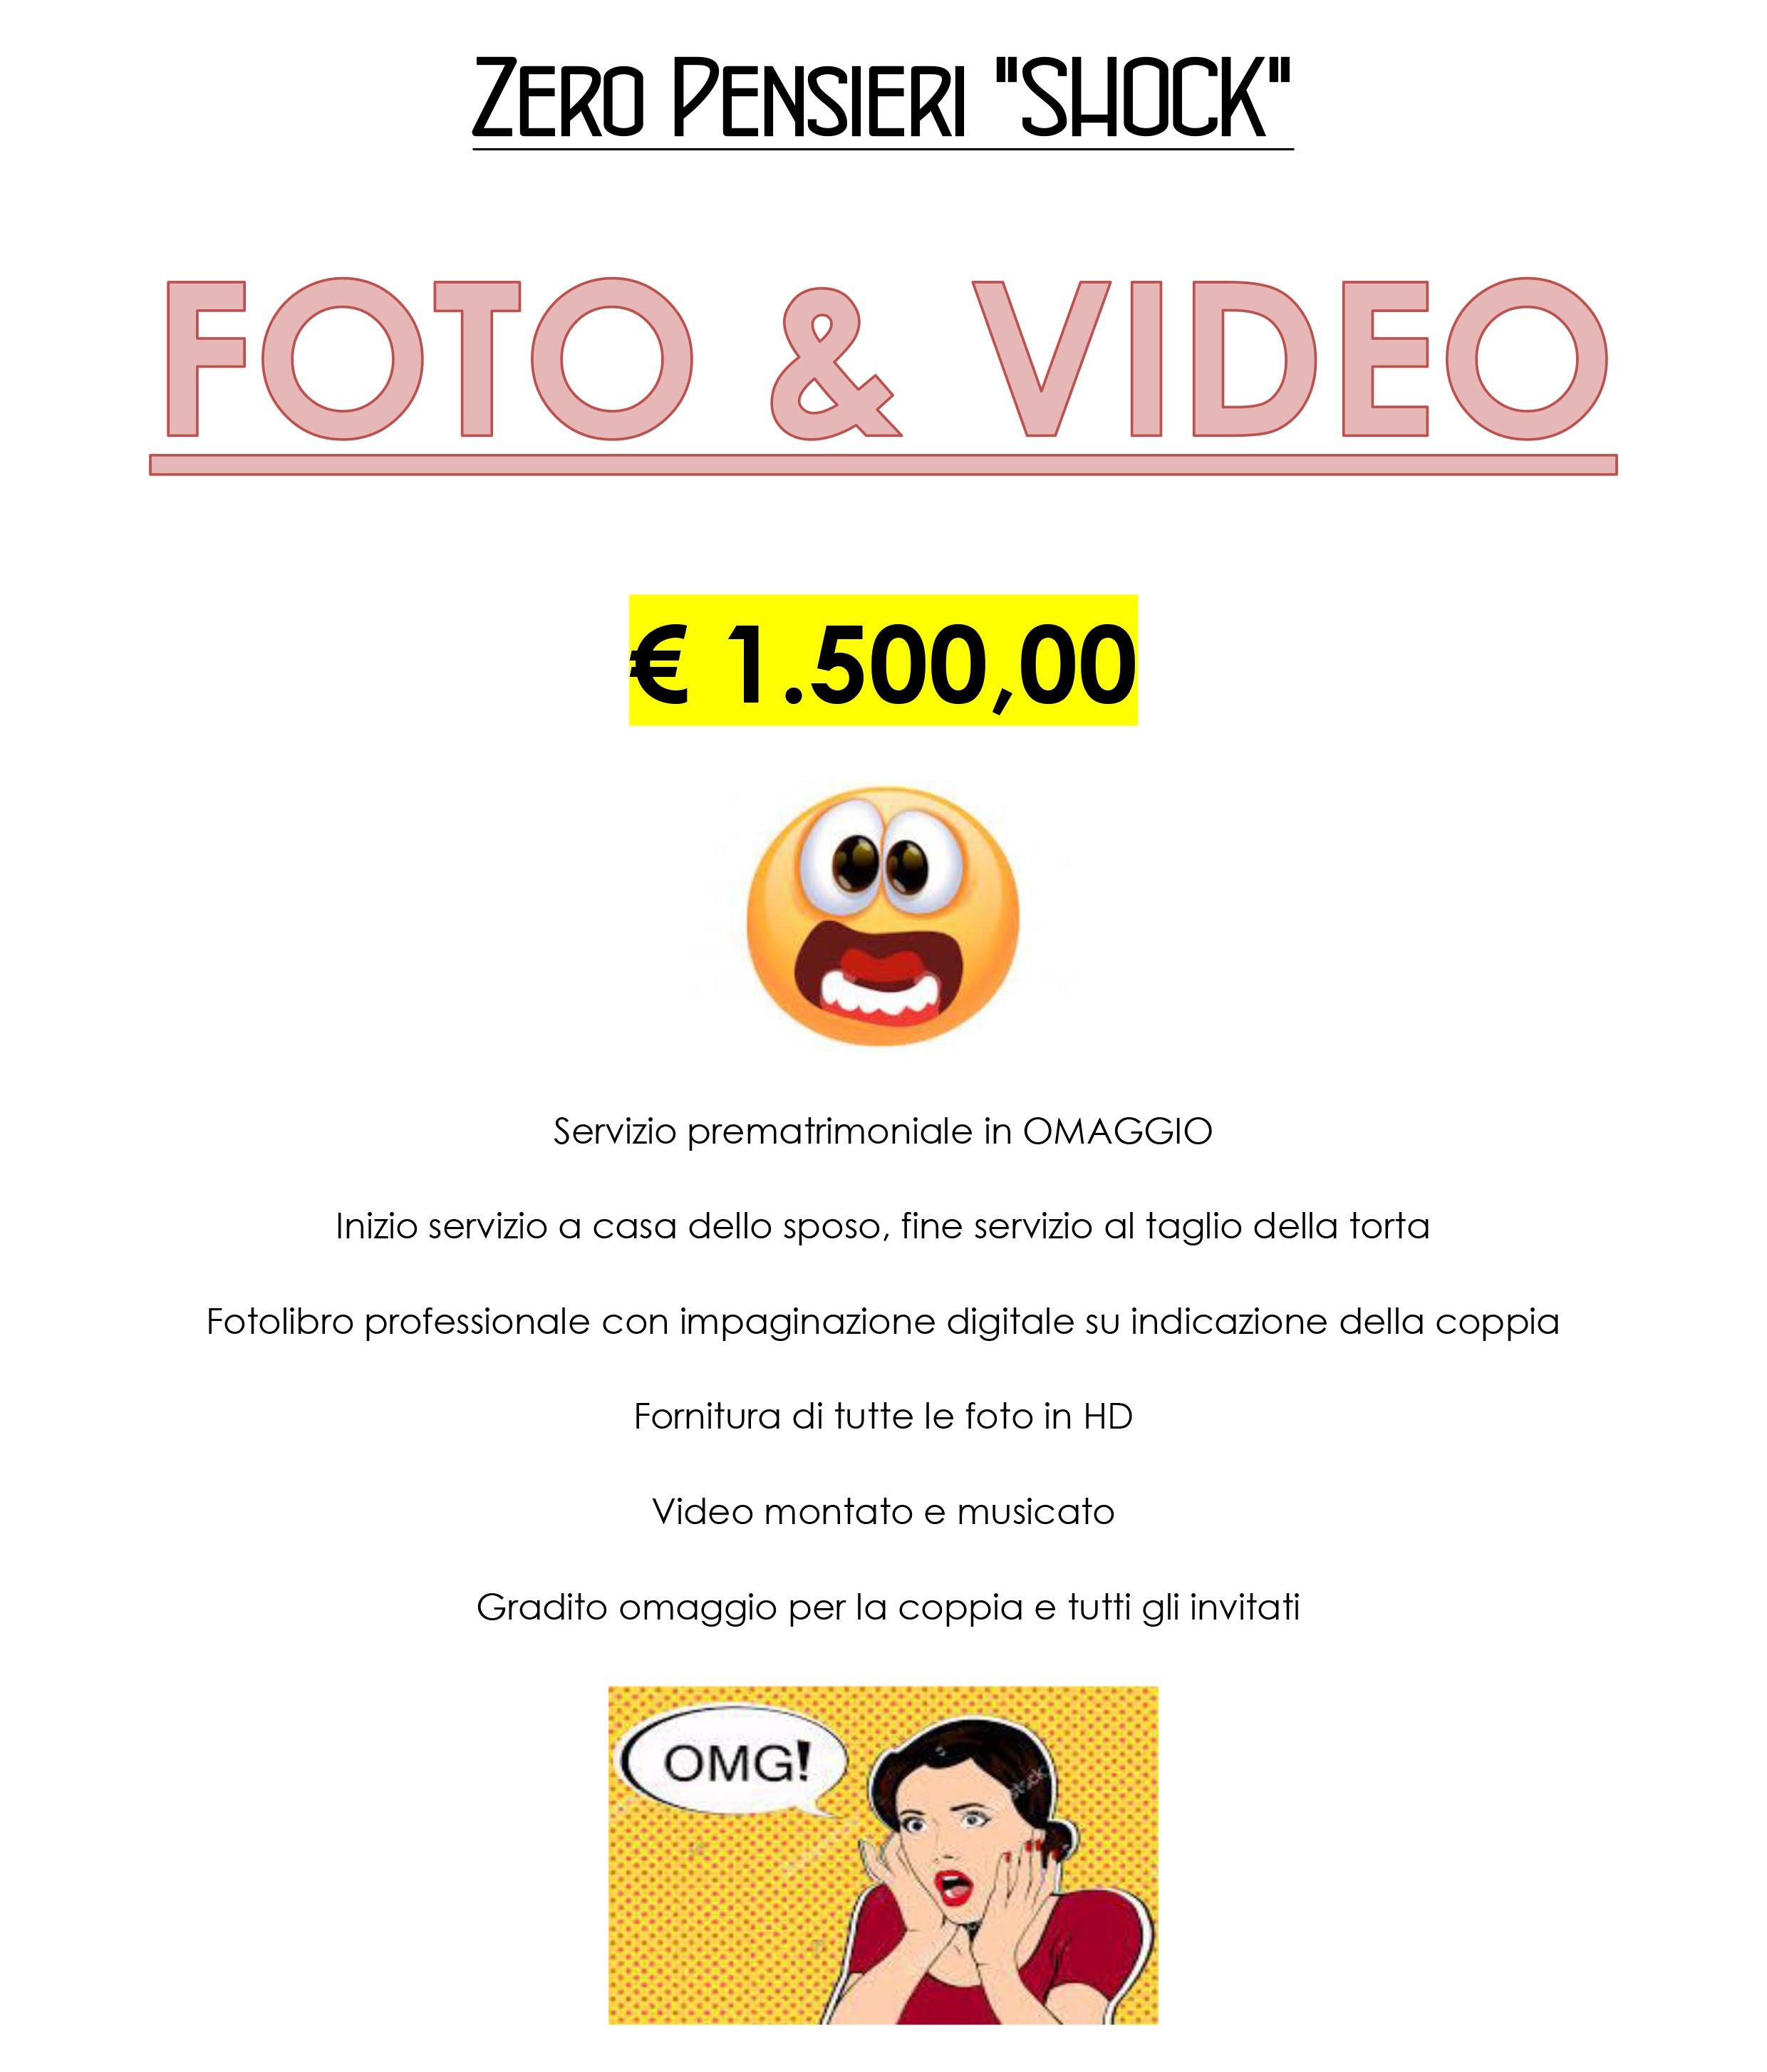 https://sites.google.com/site/fabriziofotohome/home/PROMO%202018%20Foto+Video%20-%20x%20sito.jpg